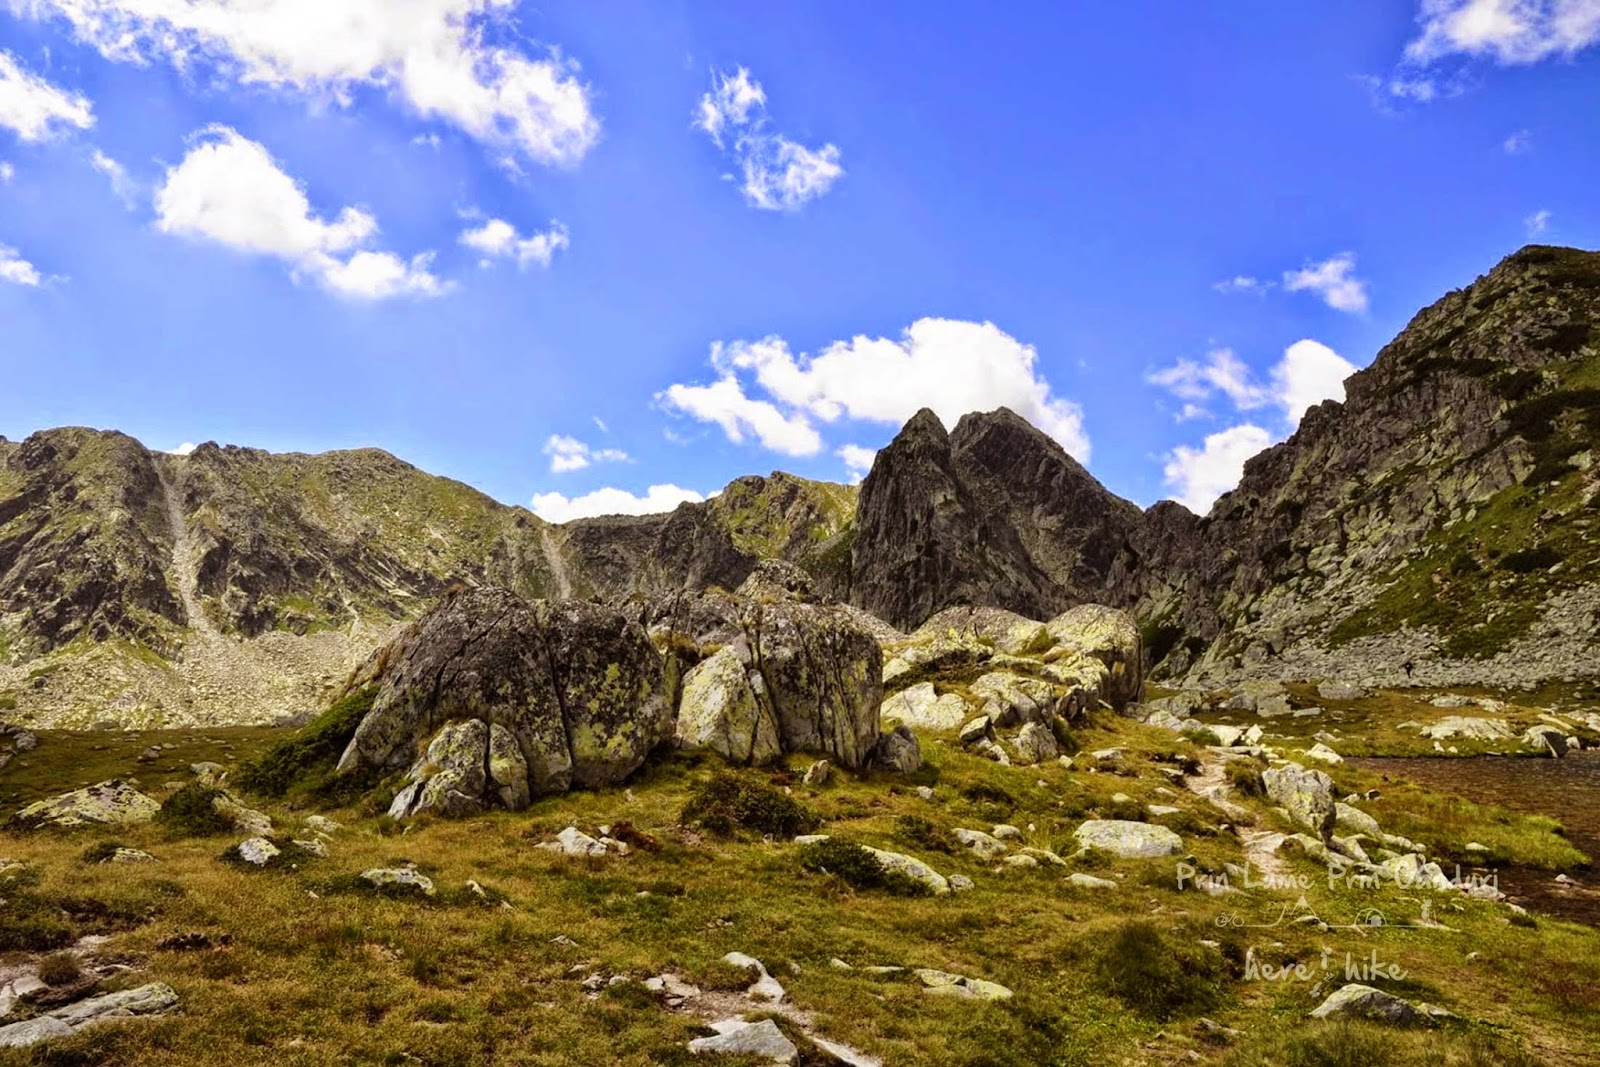 retezat-peak-hike-taul-portii